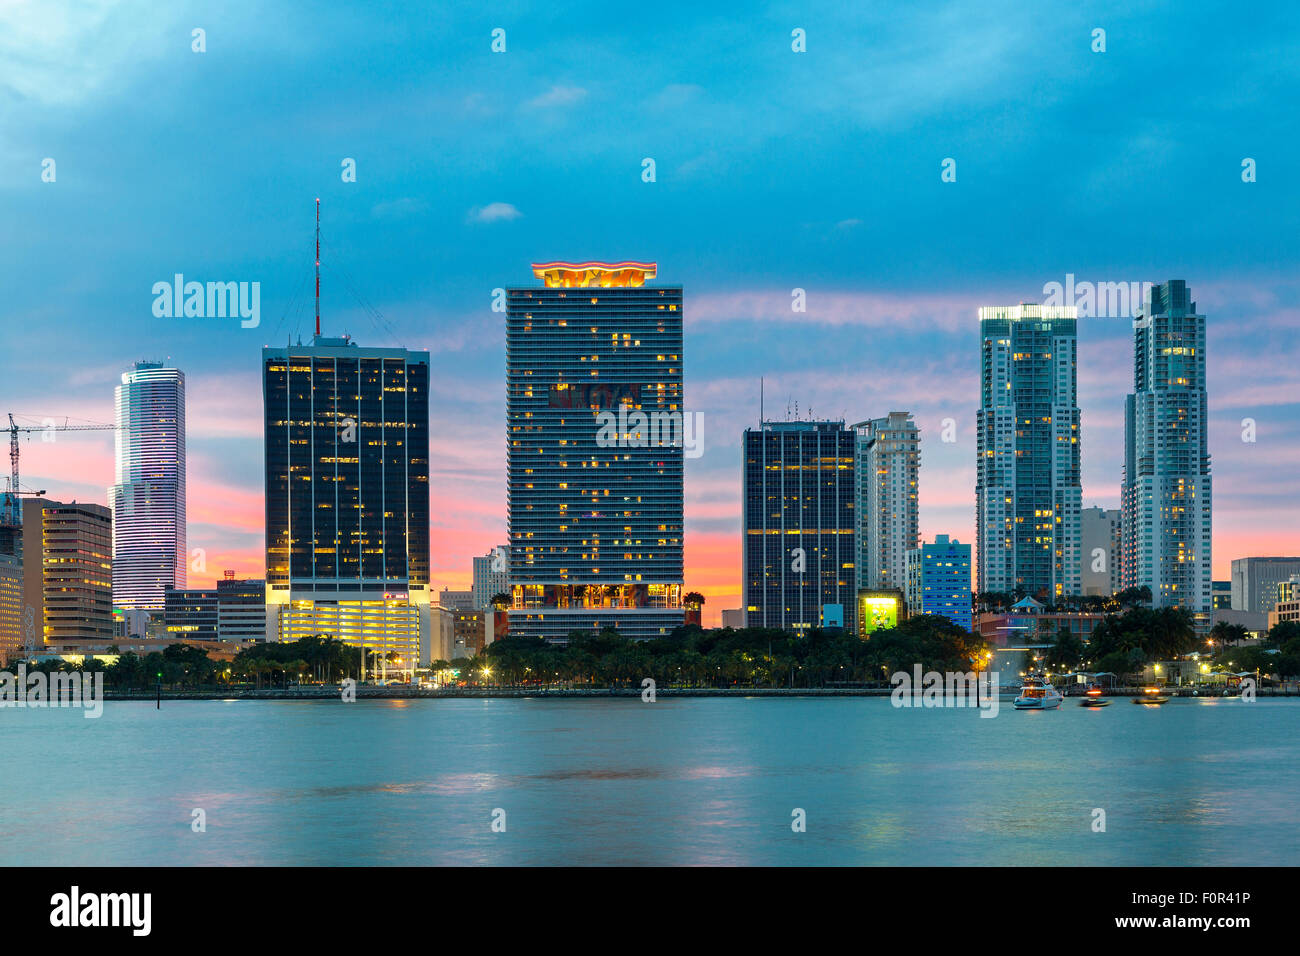 Florida, Miami Skyline at sunset - Stock Image